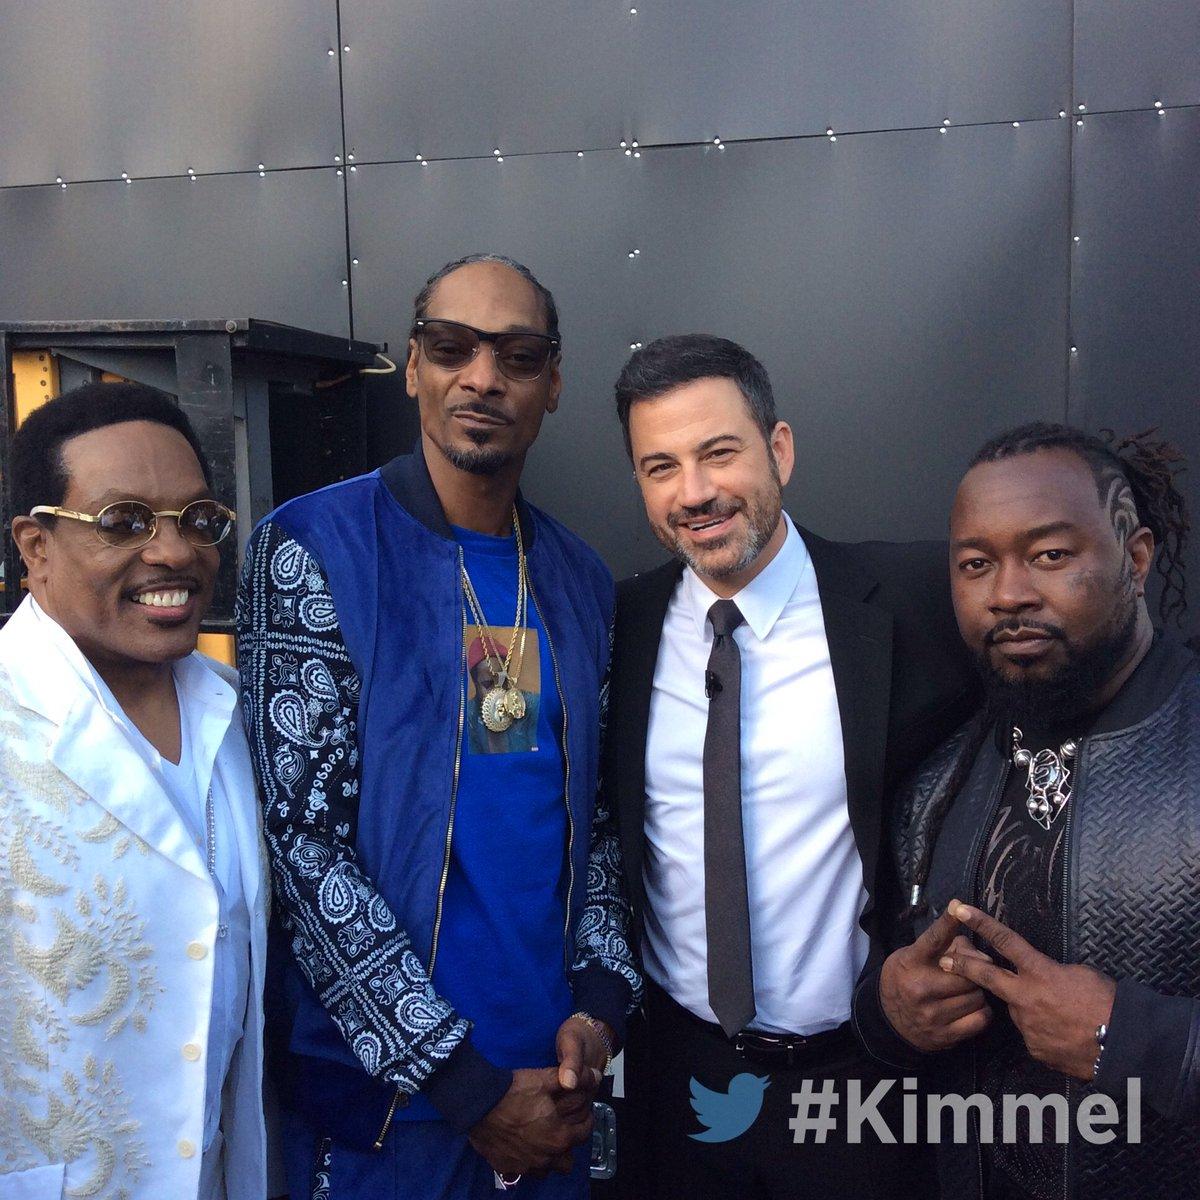 RT @JimmyKimmelLive: Backstage at #Kimmel with @SnoopDogg #BibleOfLove #JokersWild https://t.co/LtRZy2TVVz